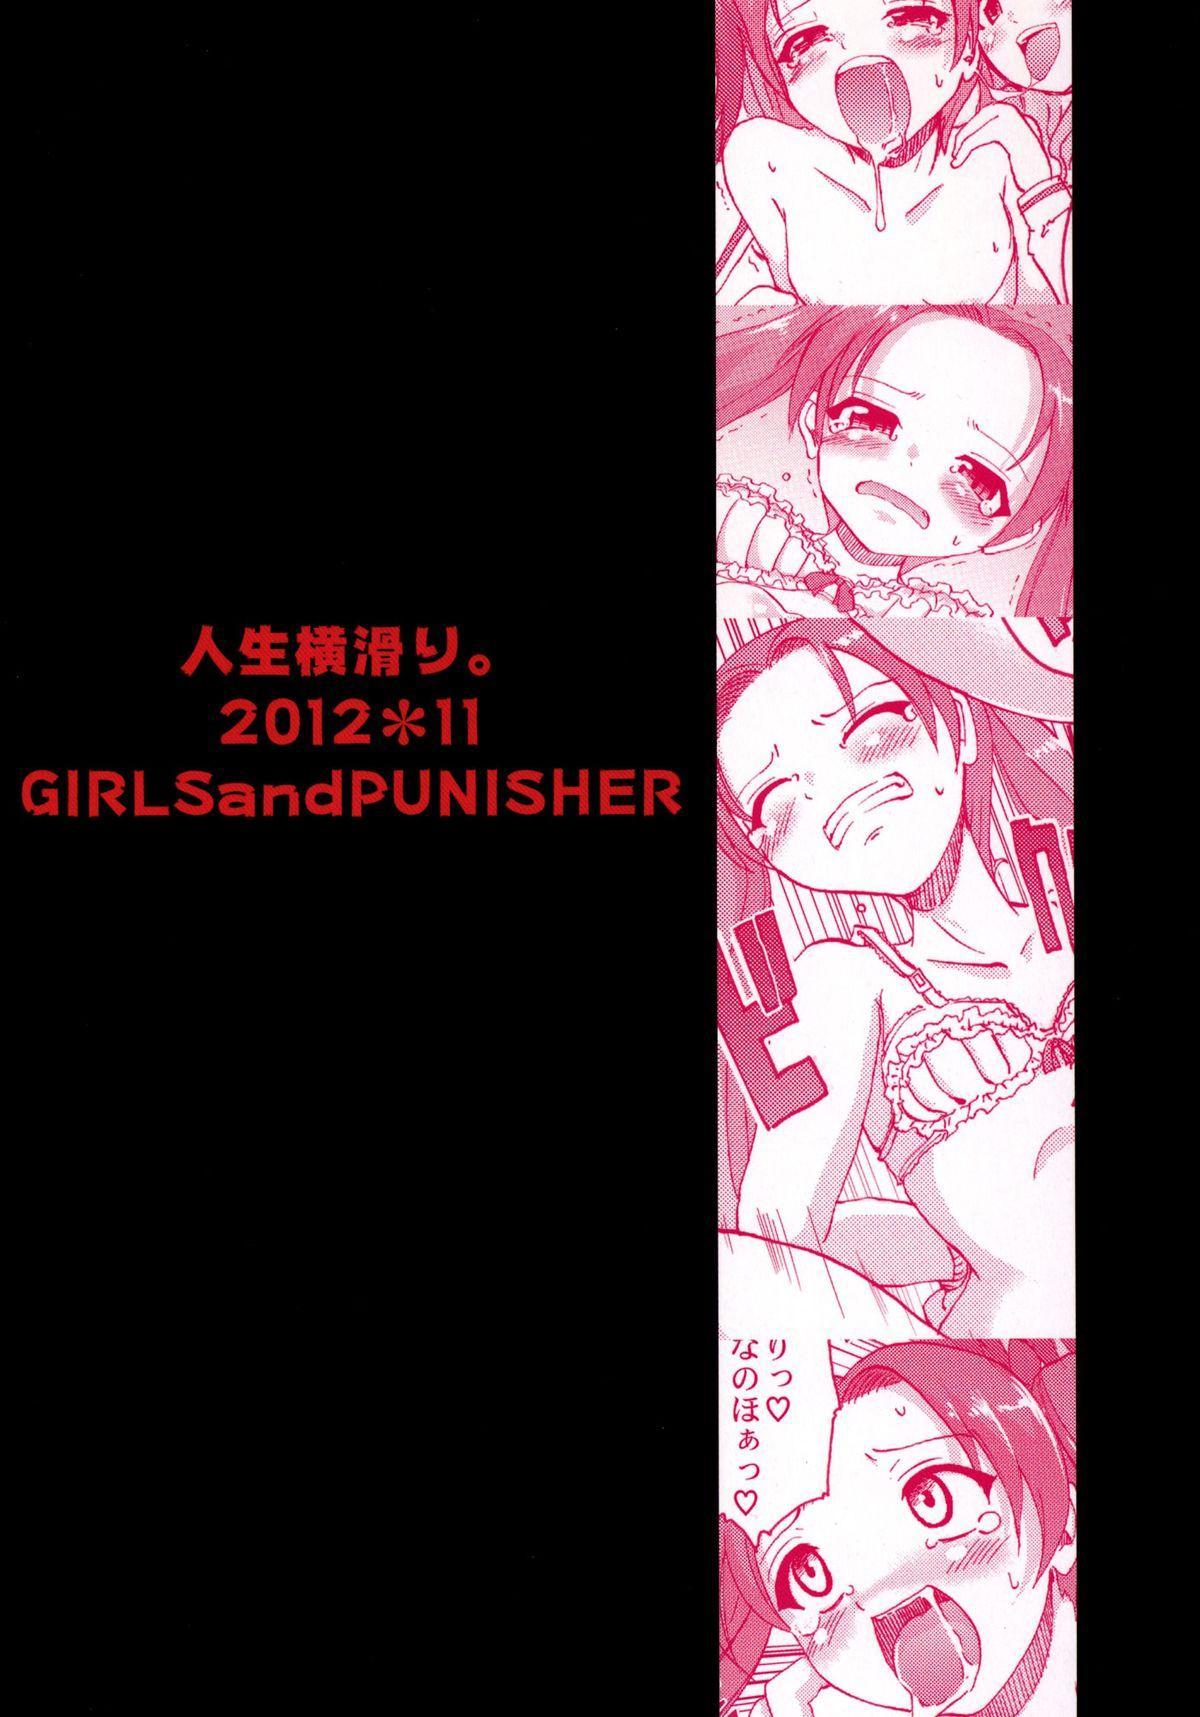 Girls & Punisher 27